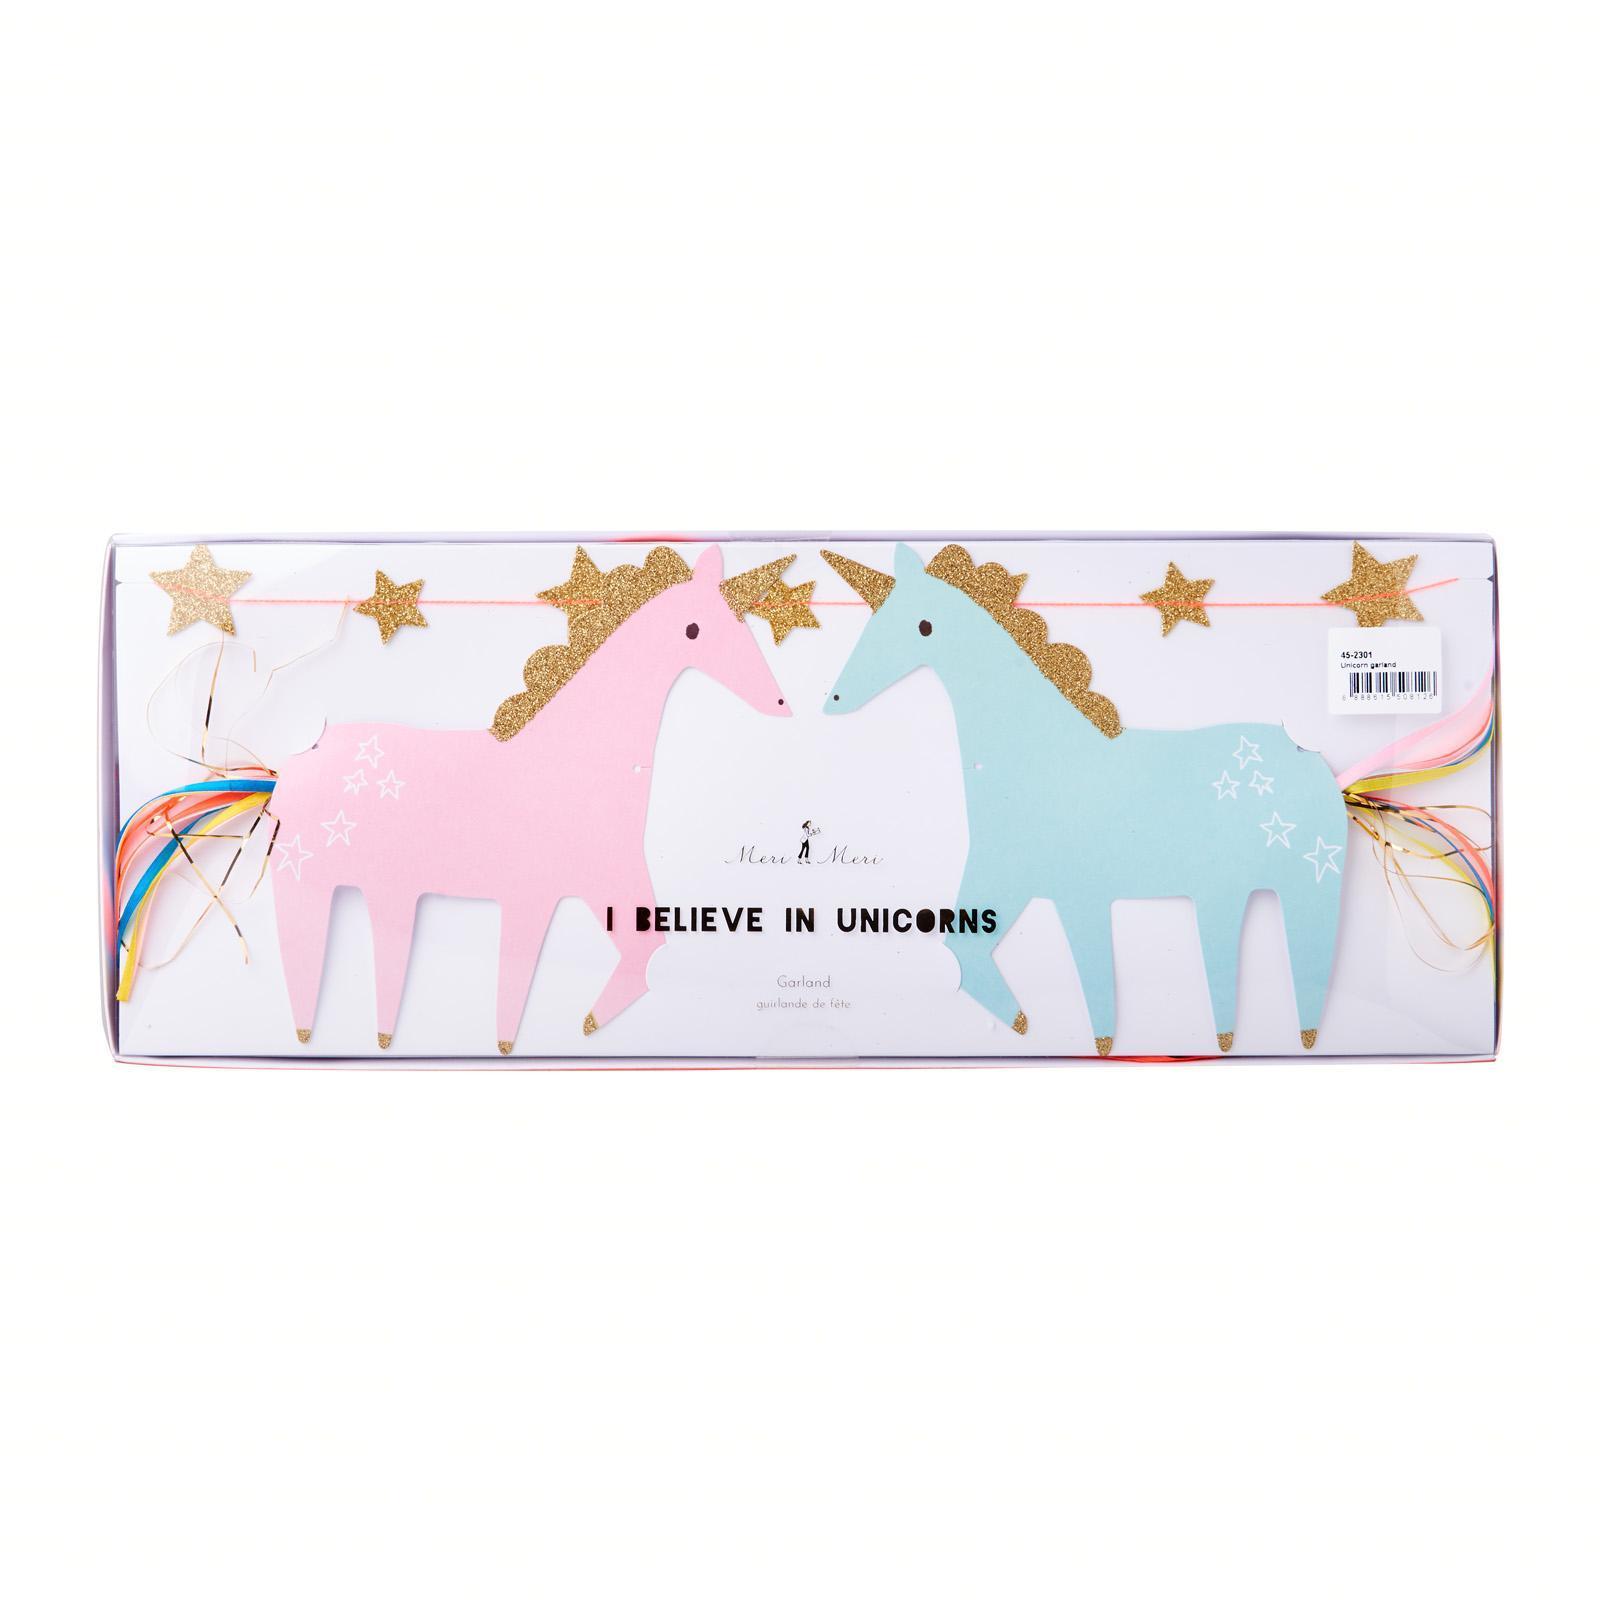 Meri Meri Garland I Believe In Unicorns - By ToTT